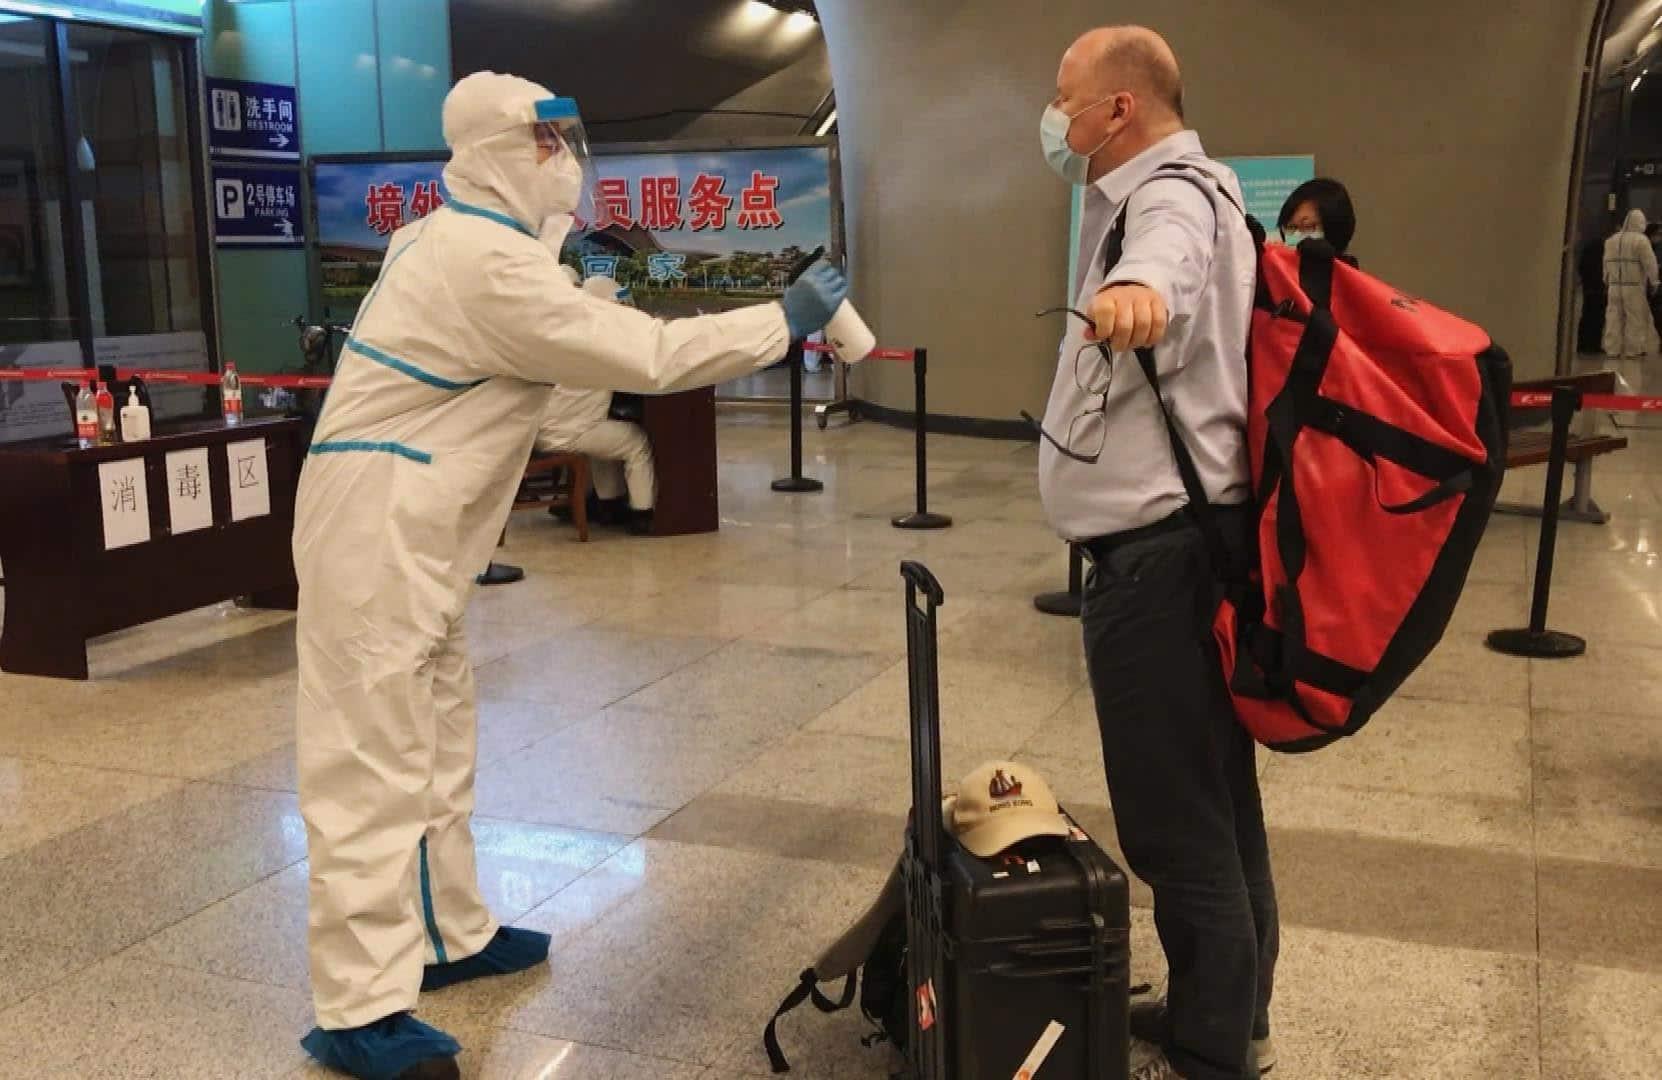 auslandsjournal - die doku: Rückkehr nach Wuhan